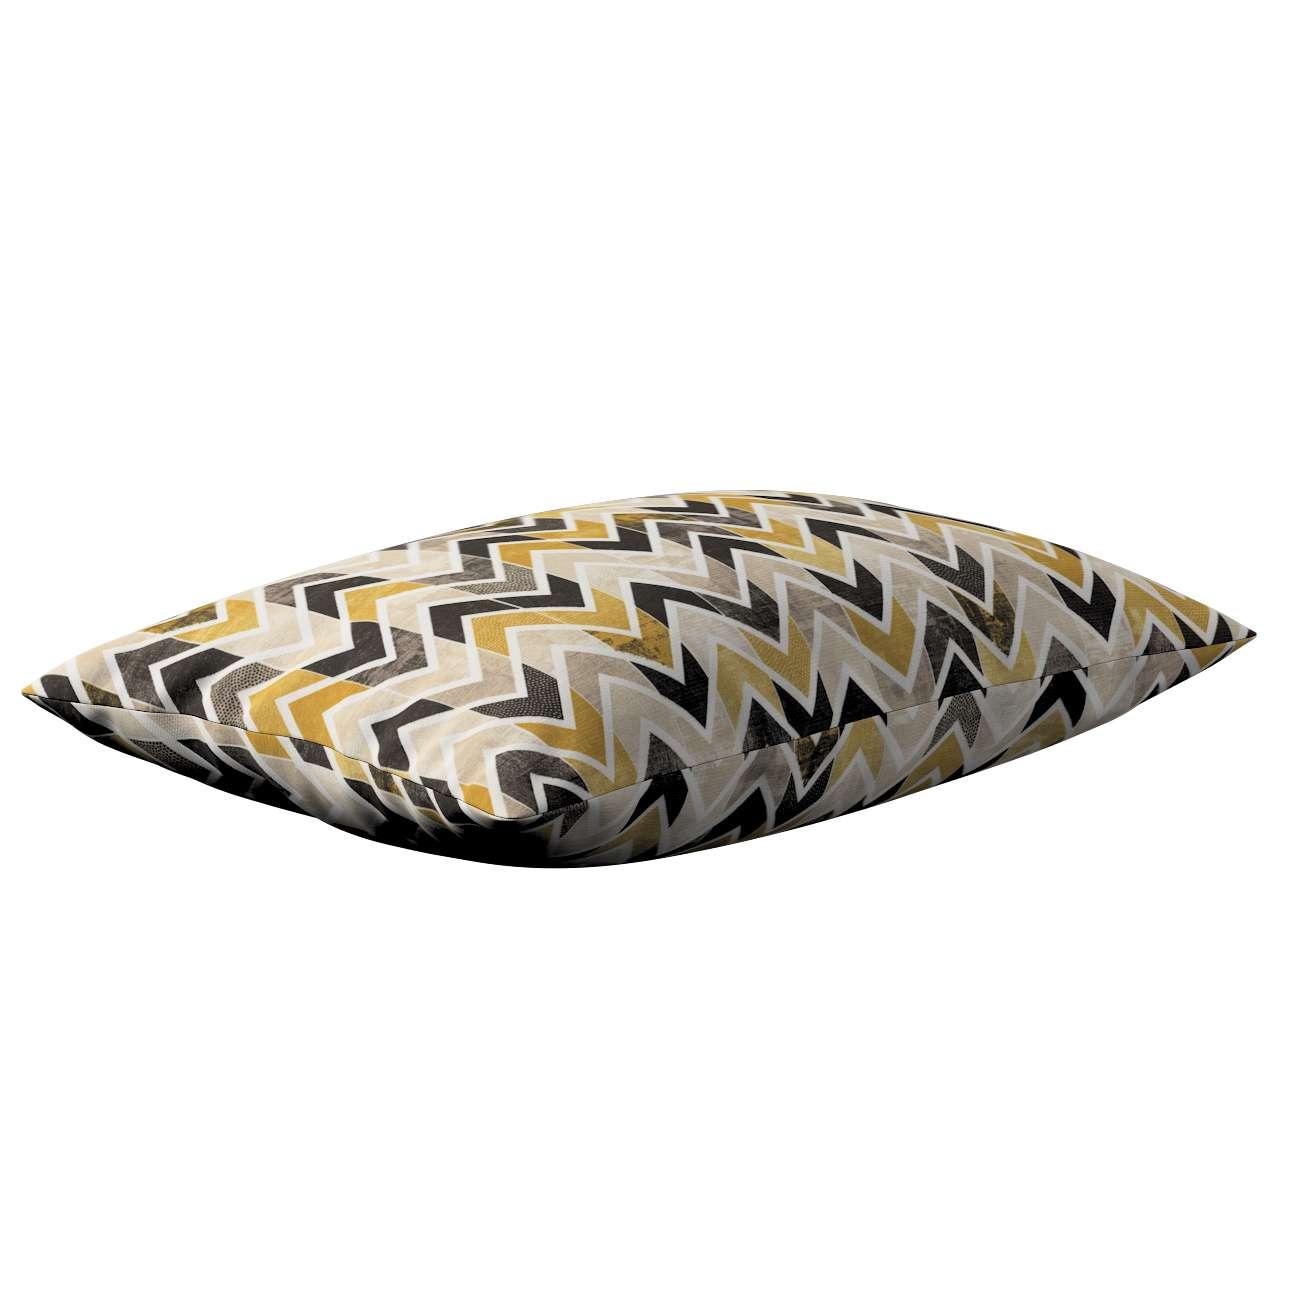 Kinga - potah na polštář jednoduchý obdélníkový v kolekci Modern, látka: 142-79